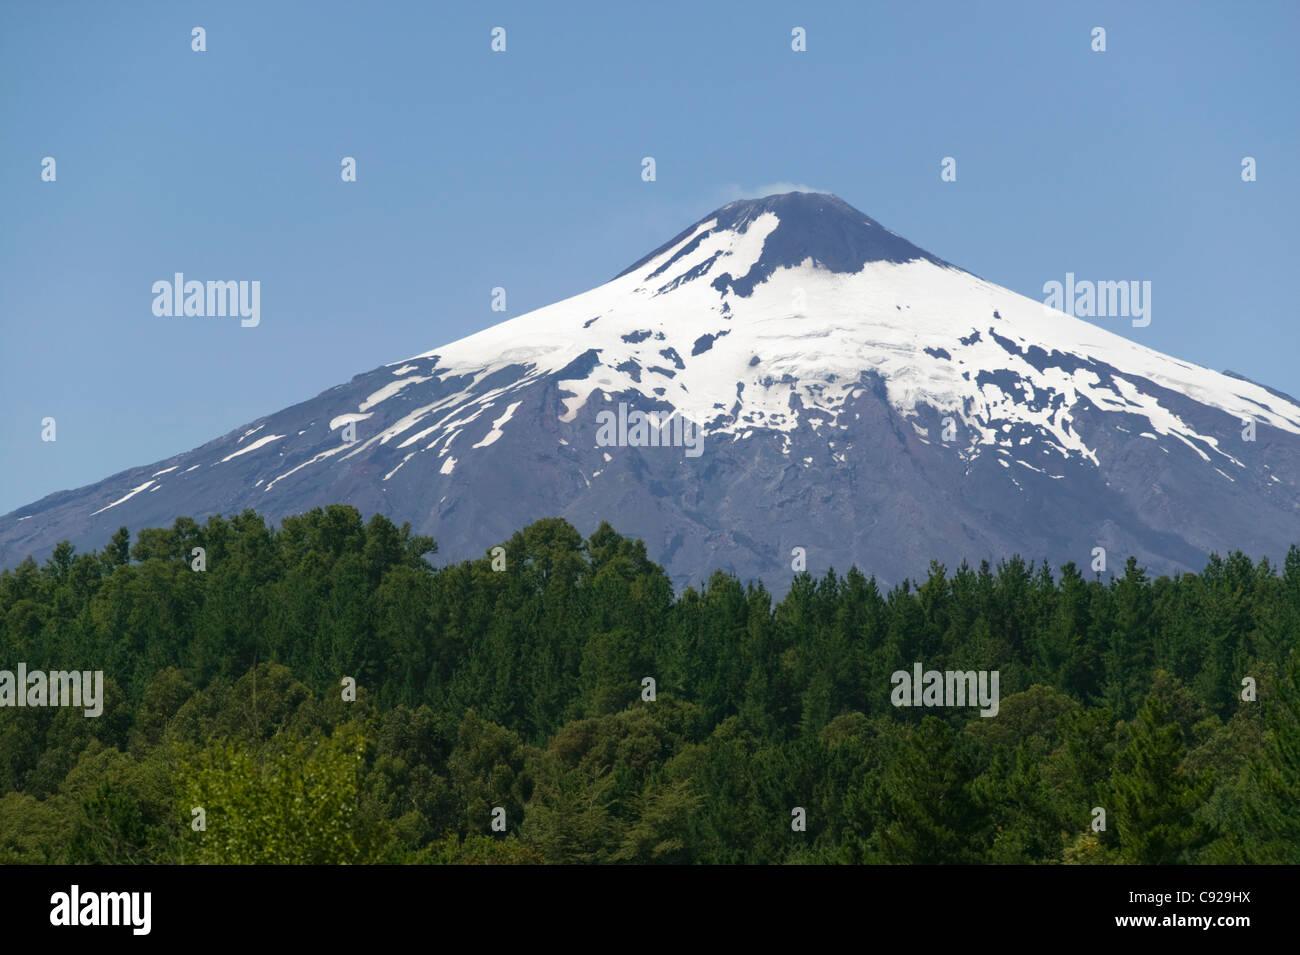 Snowcapped Imágenes De Stock Snowcapped Fotos De Stock: Snow Capped Volcanoes Stock Photos & Snow Capped Volcanoes